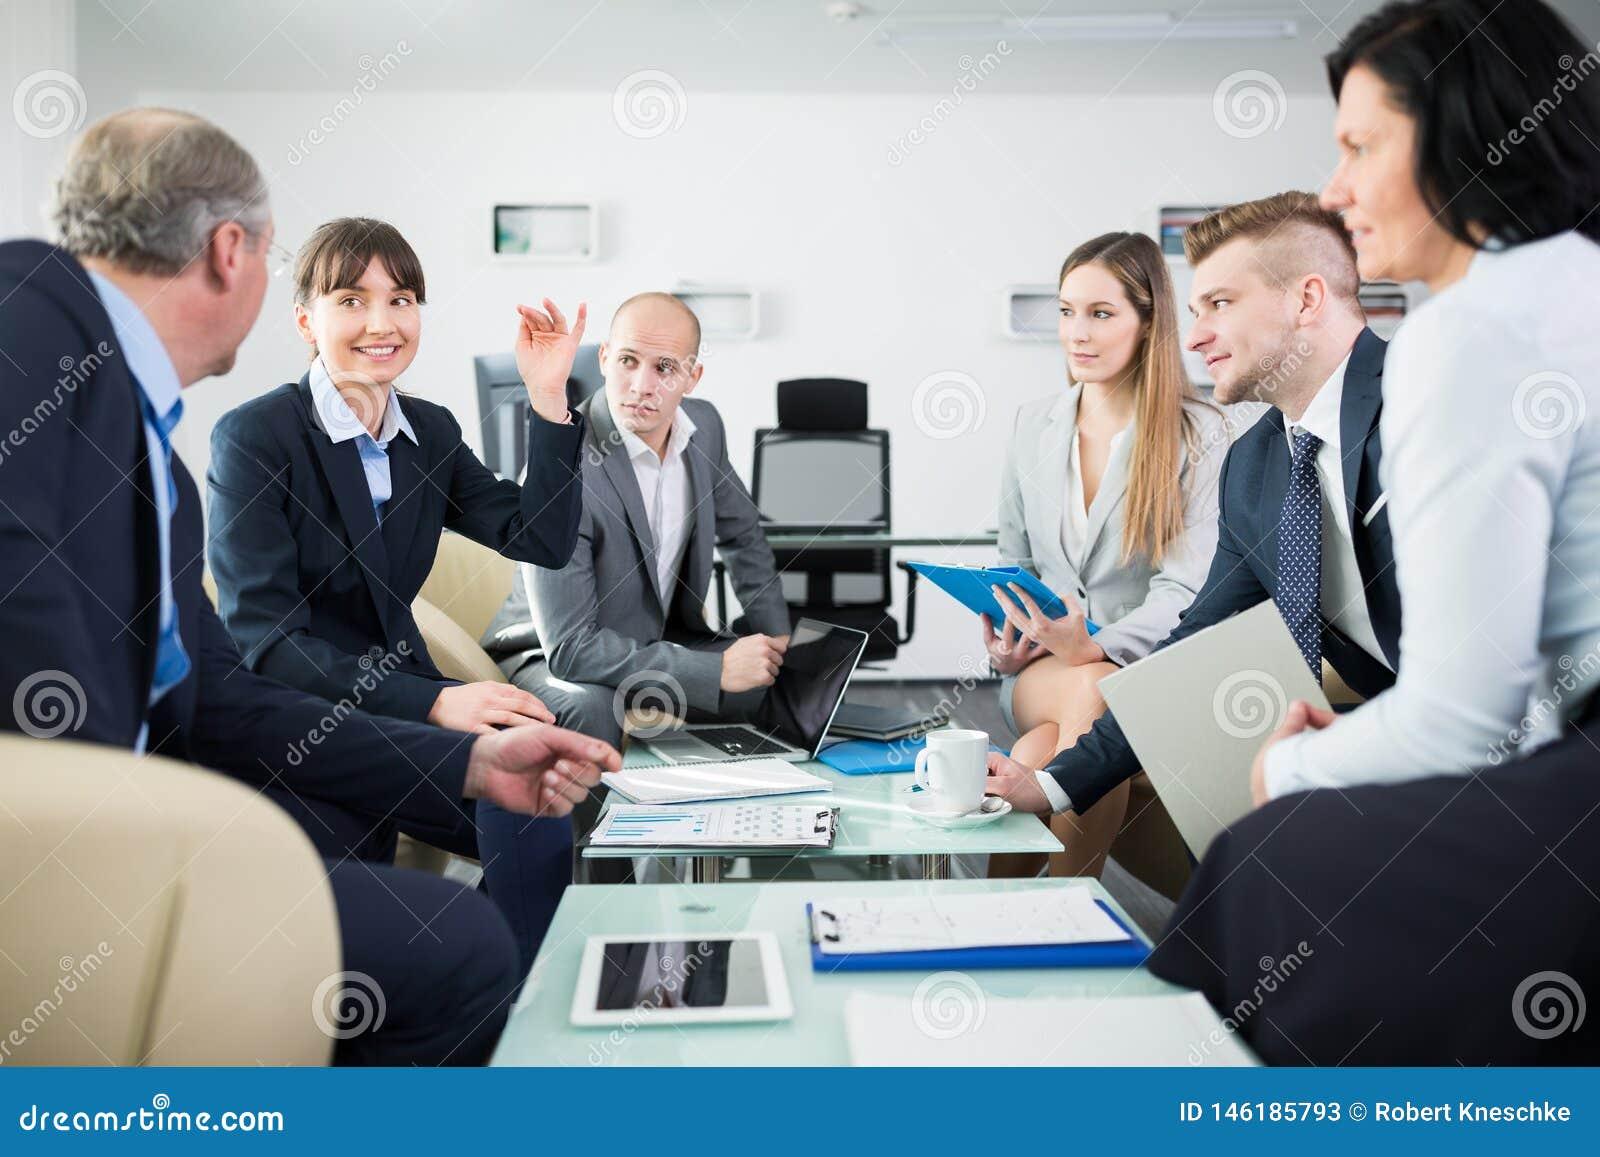 Le affärskvinnan Discussing With Colleagues i regeringsställning